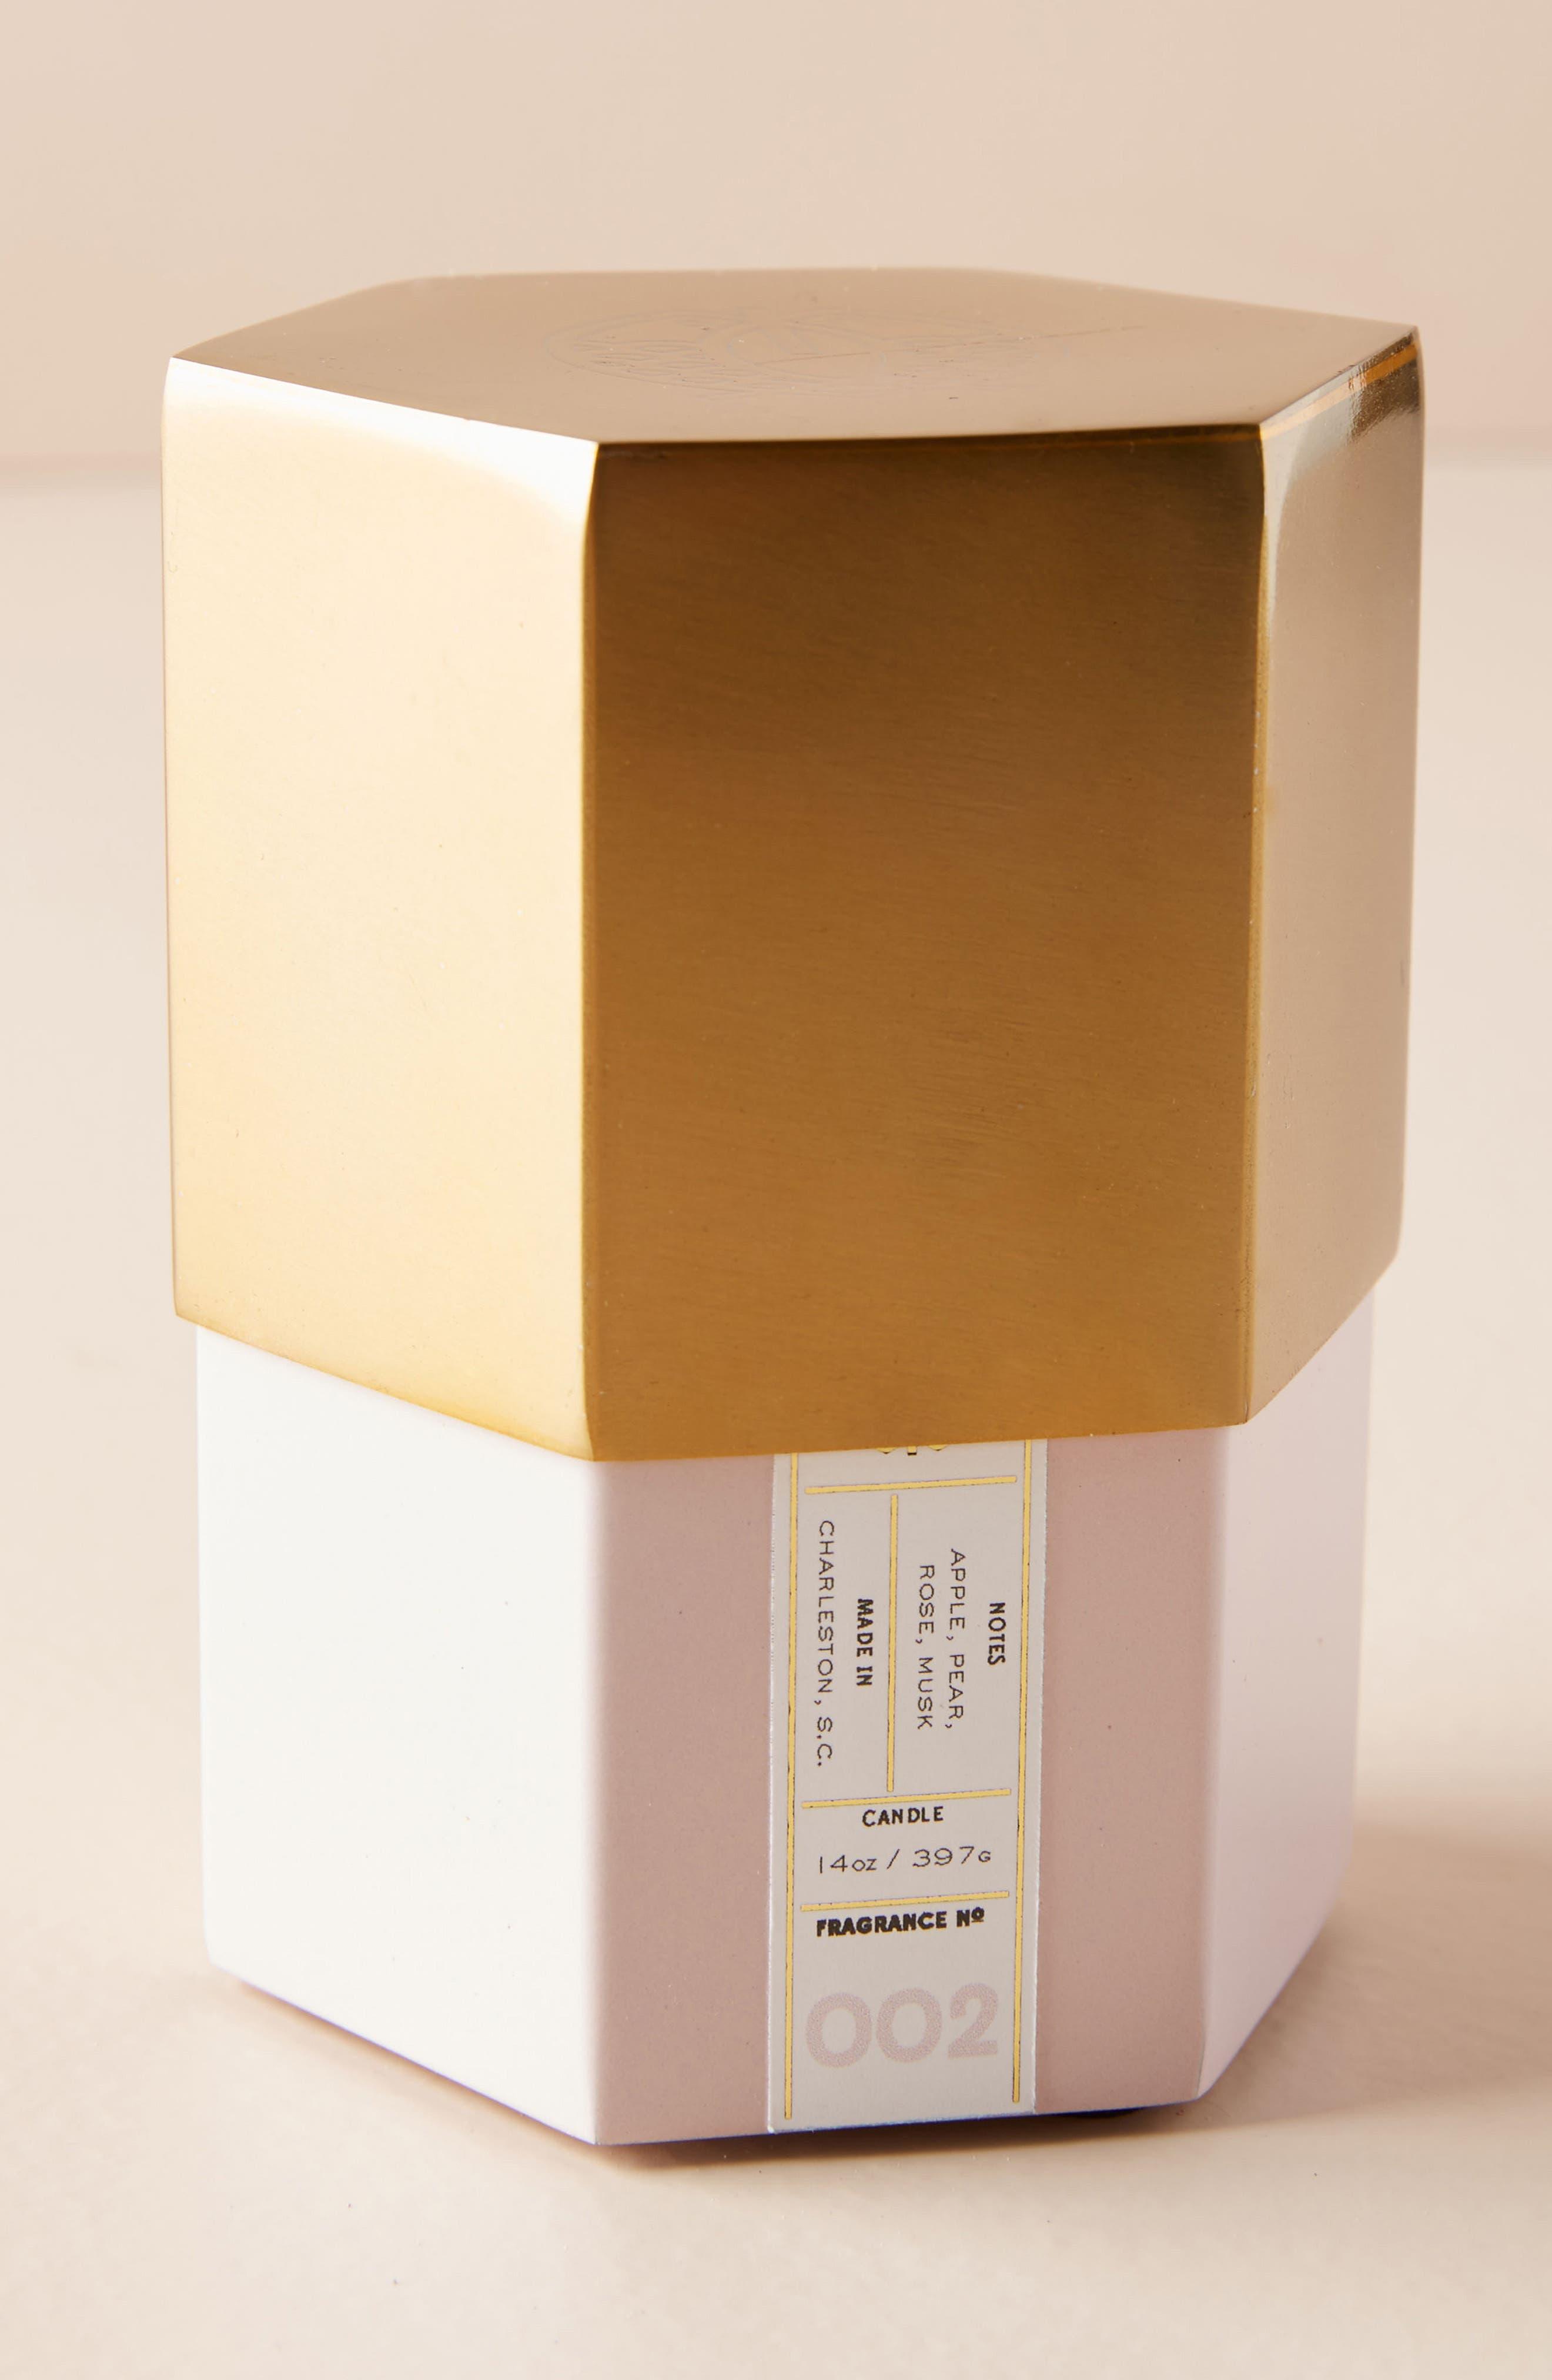 Candlefish Hexagonal Candle,                         Main,                         color, Apple Blossom/ Tart Pear/ Rose